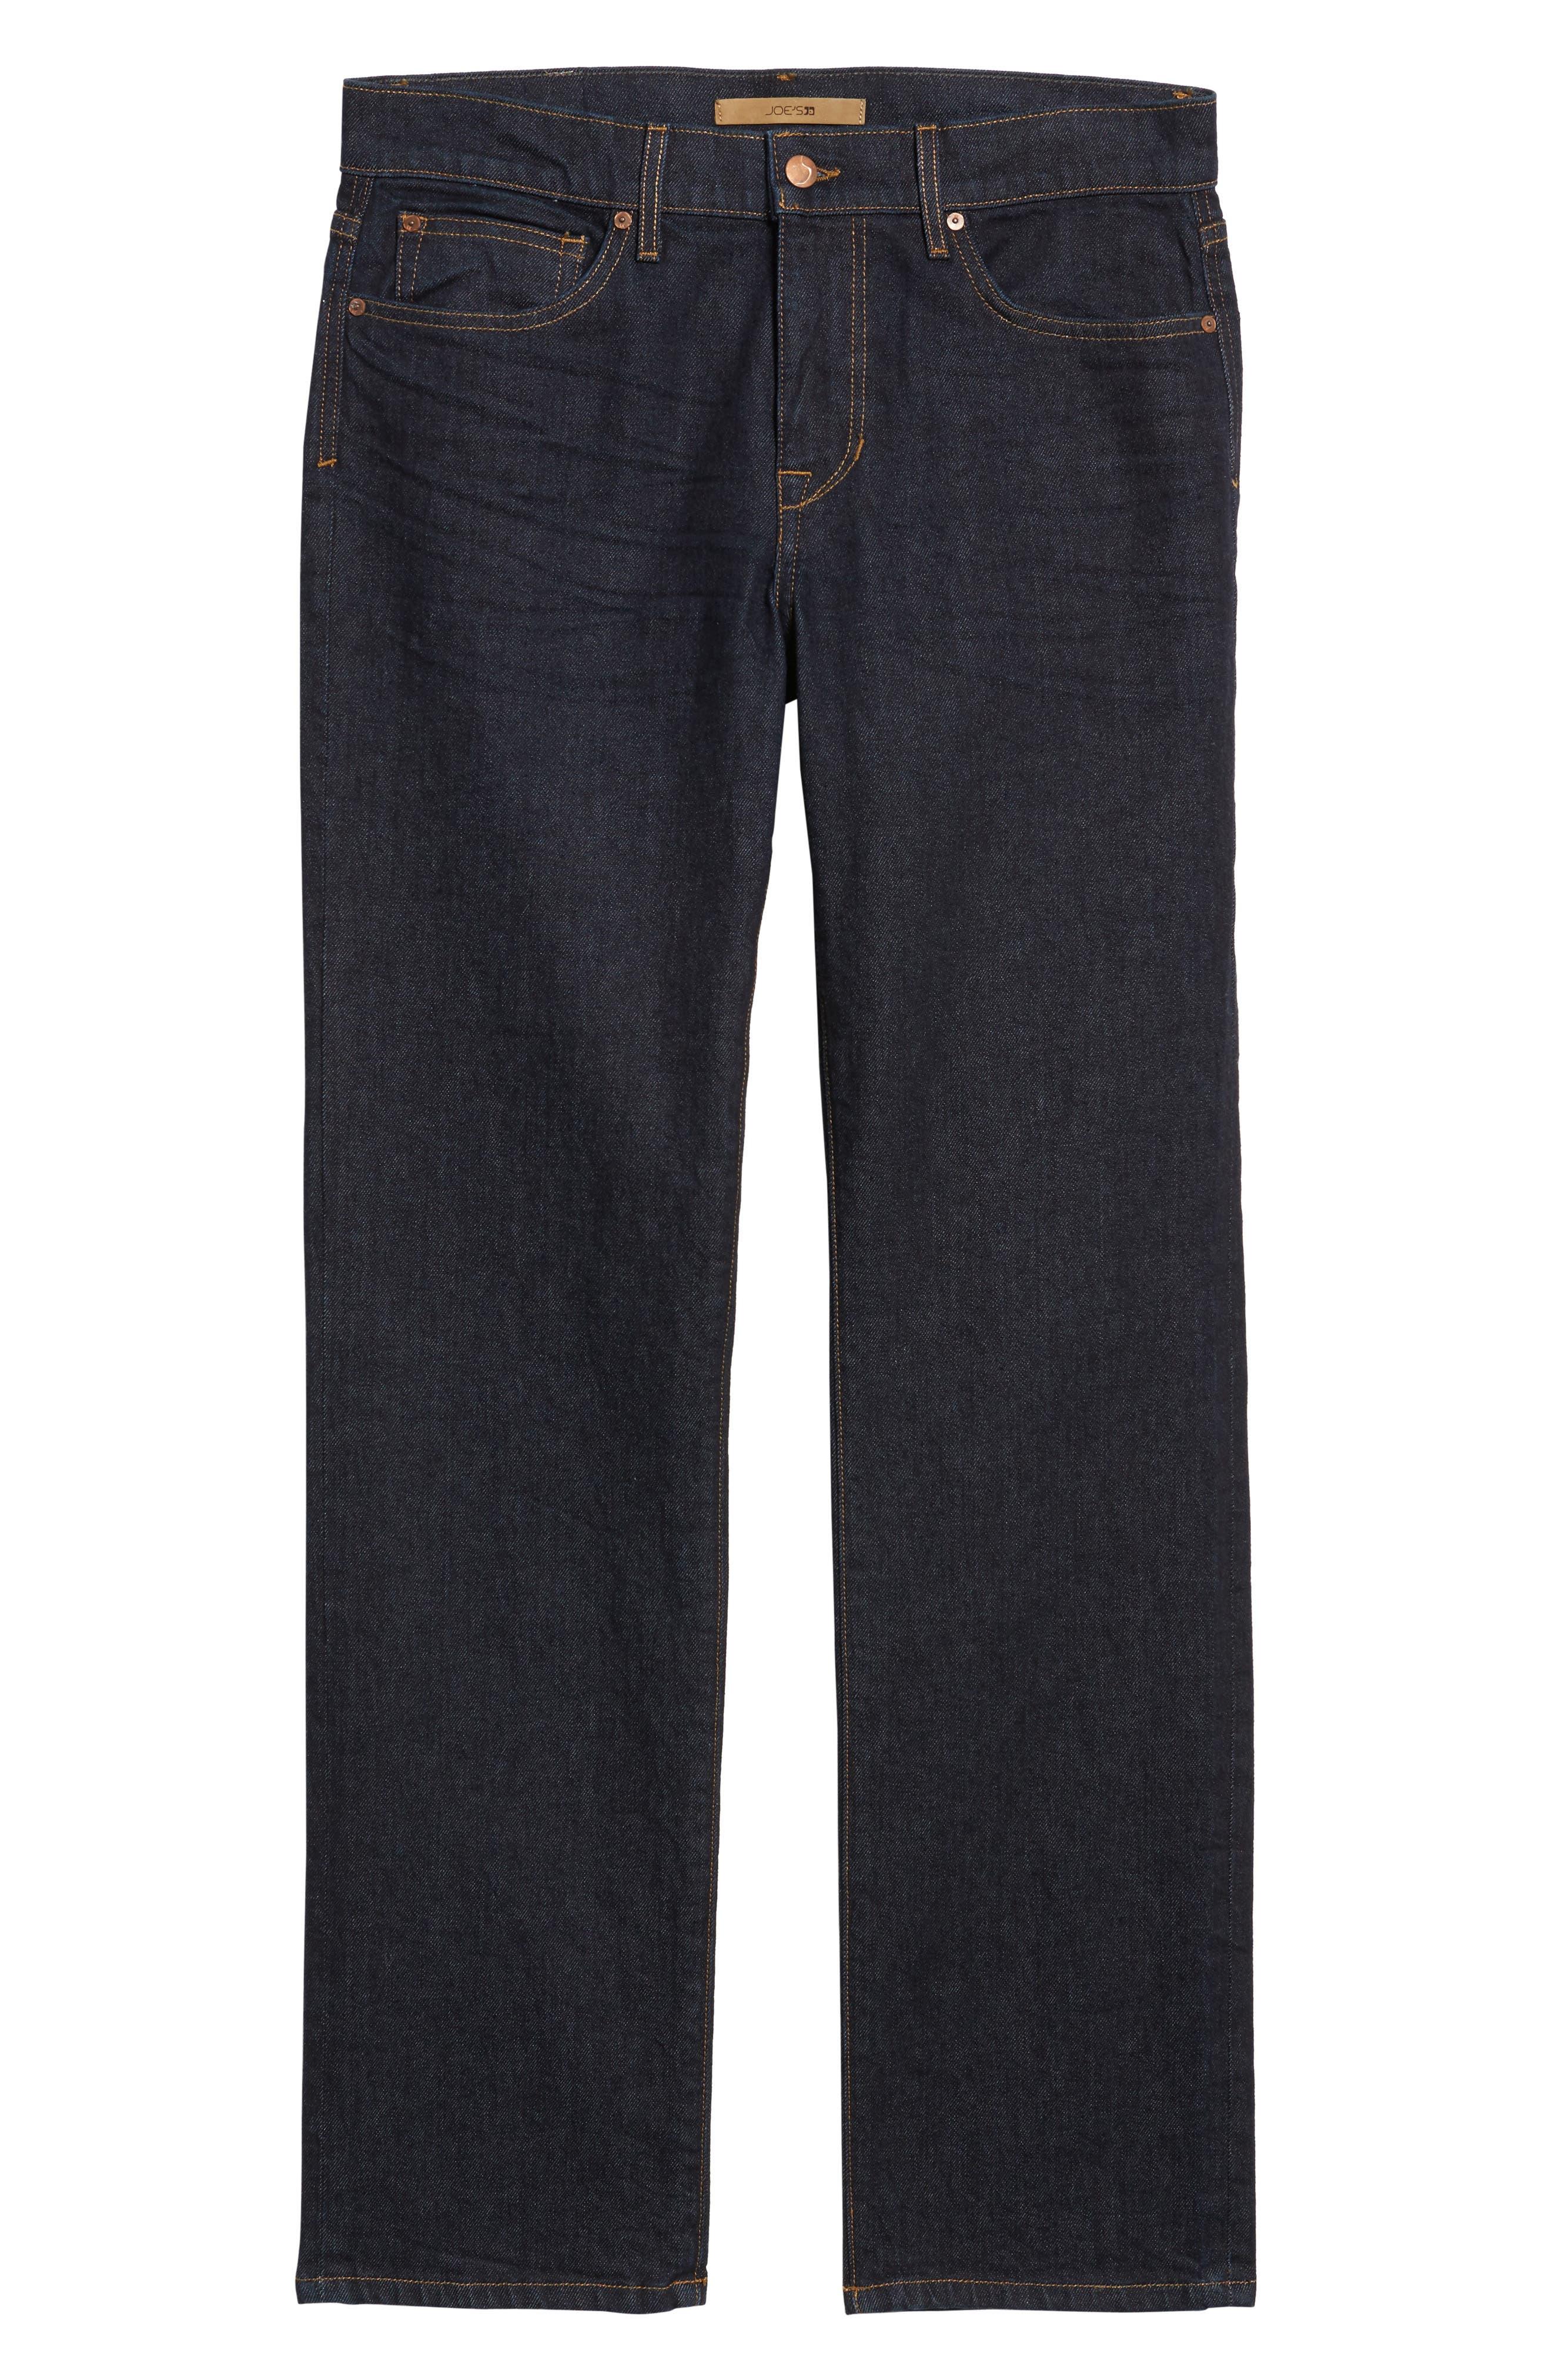 Brixton Slim Straight Leg Jeans,                             Alternate thumbnail 6, color,                             Halford